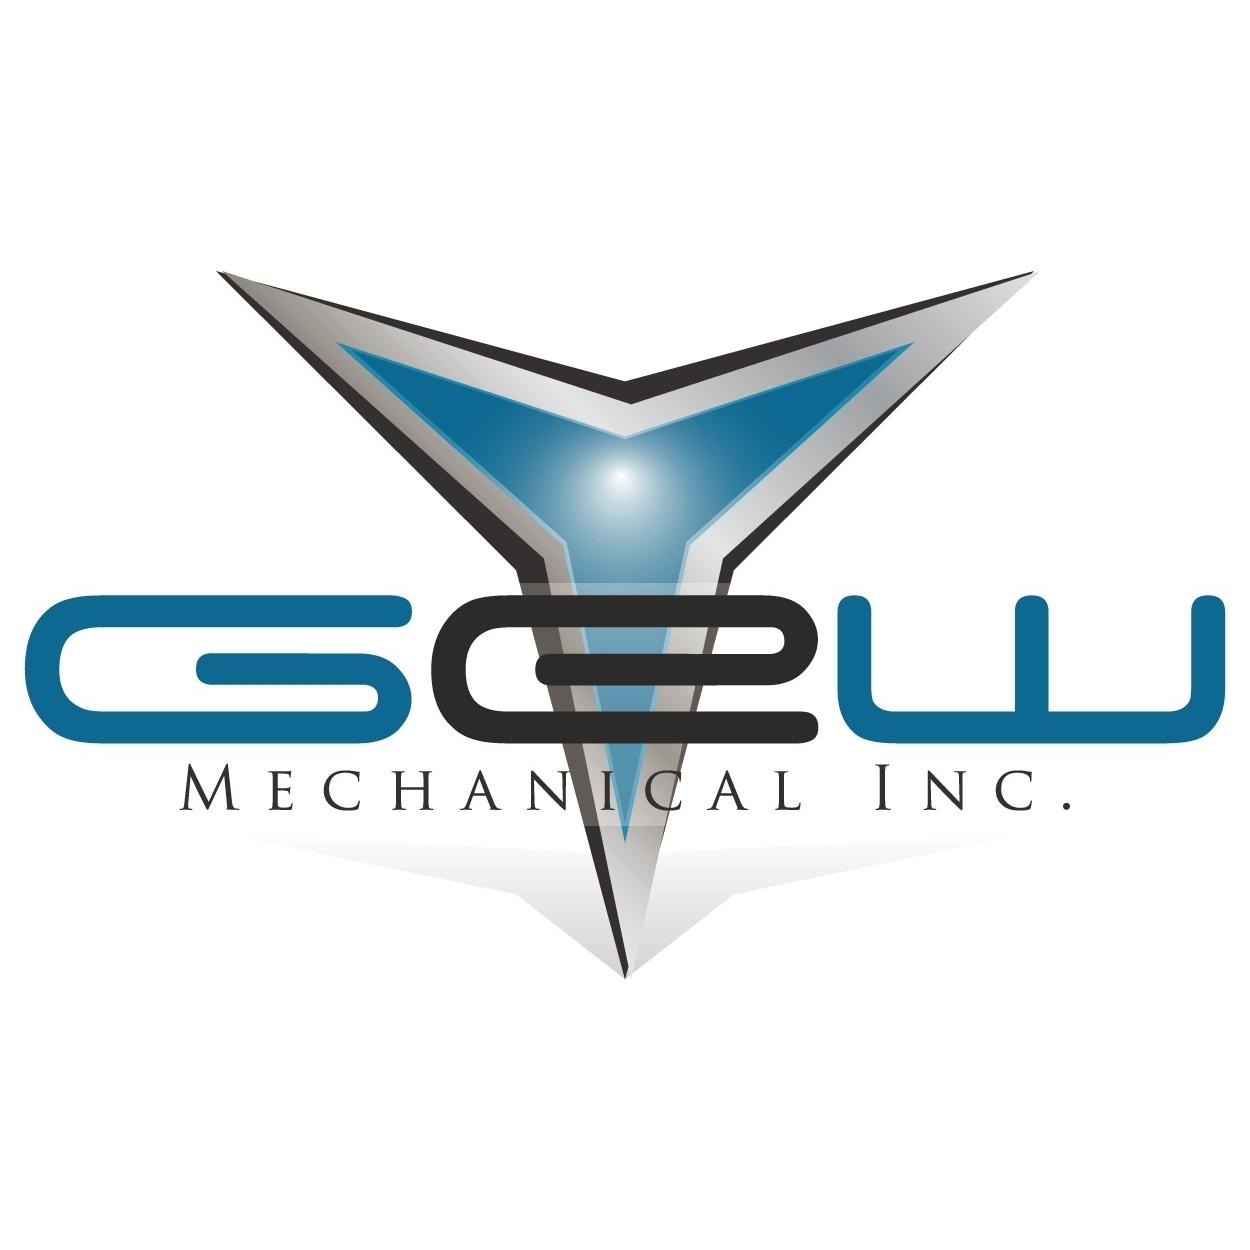 GEW Mechanical Inc. image 2